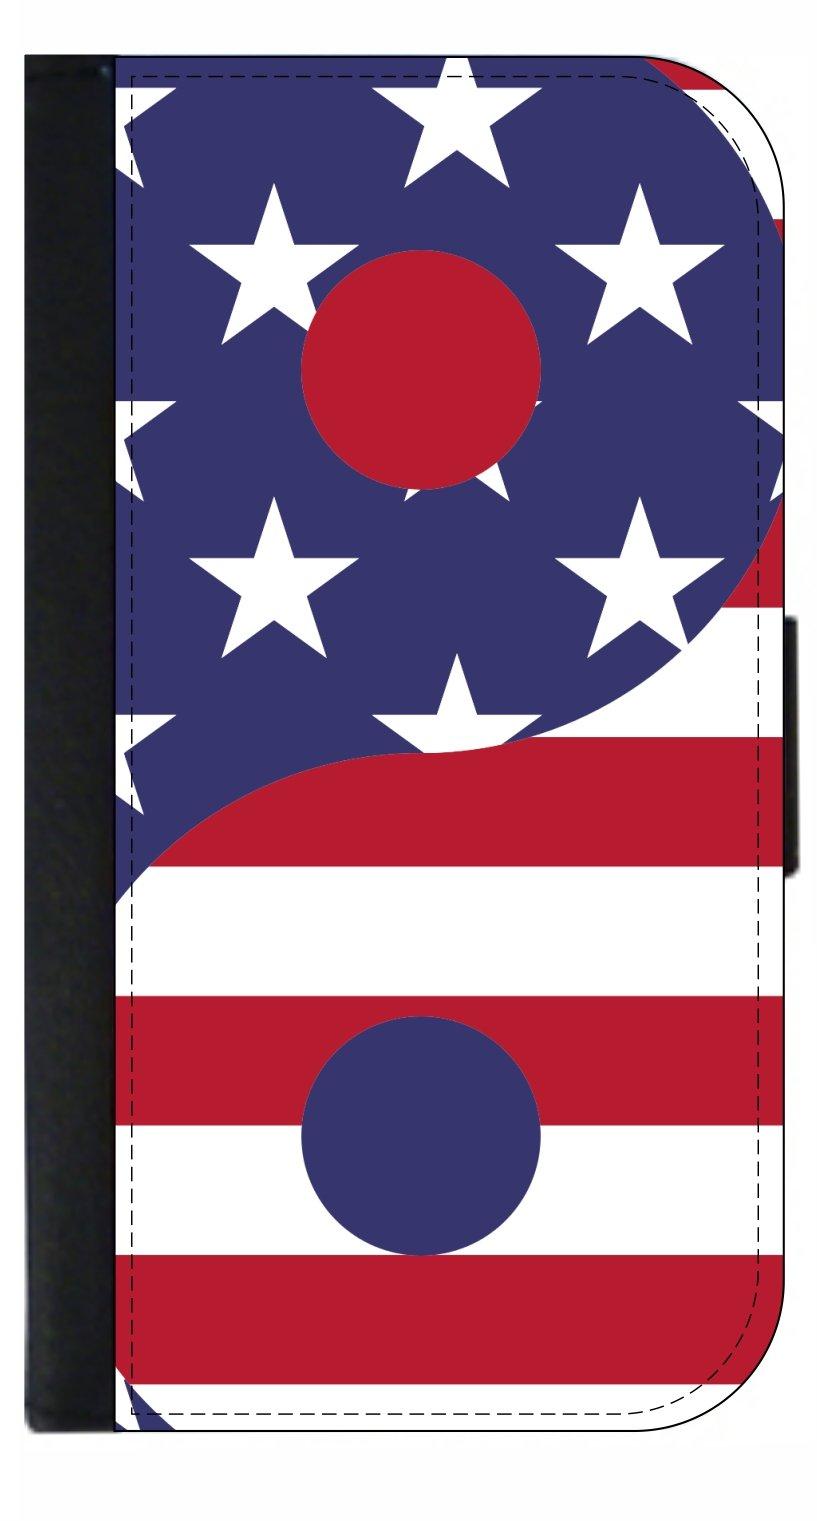 Yin Yang American Flag Design Passport Cover / Card Holder for Travel